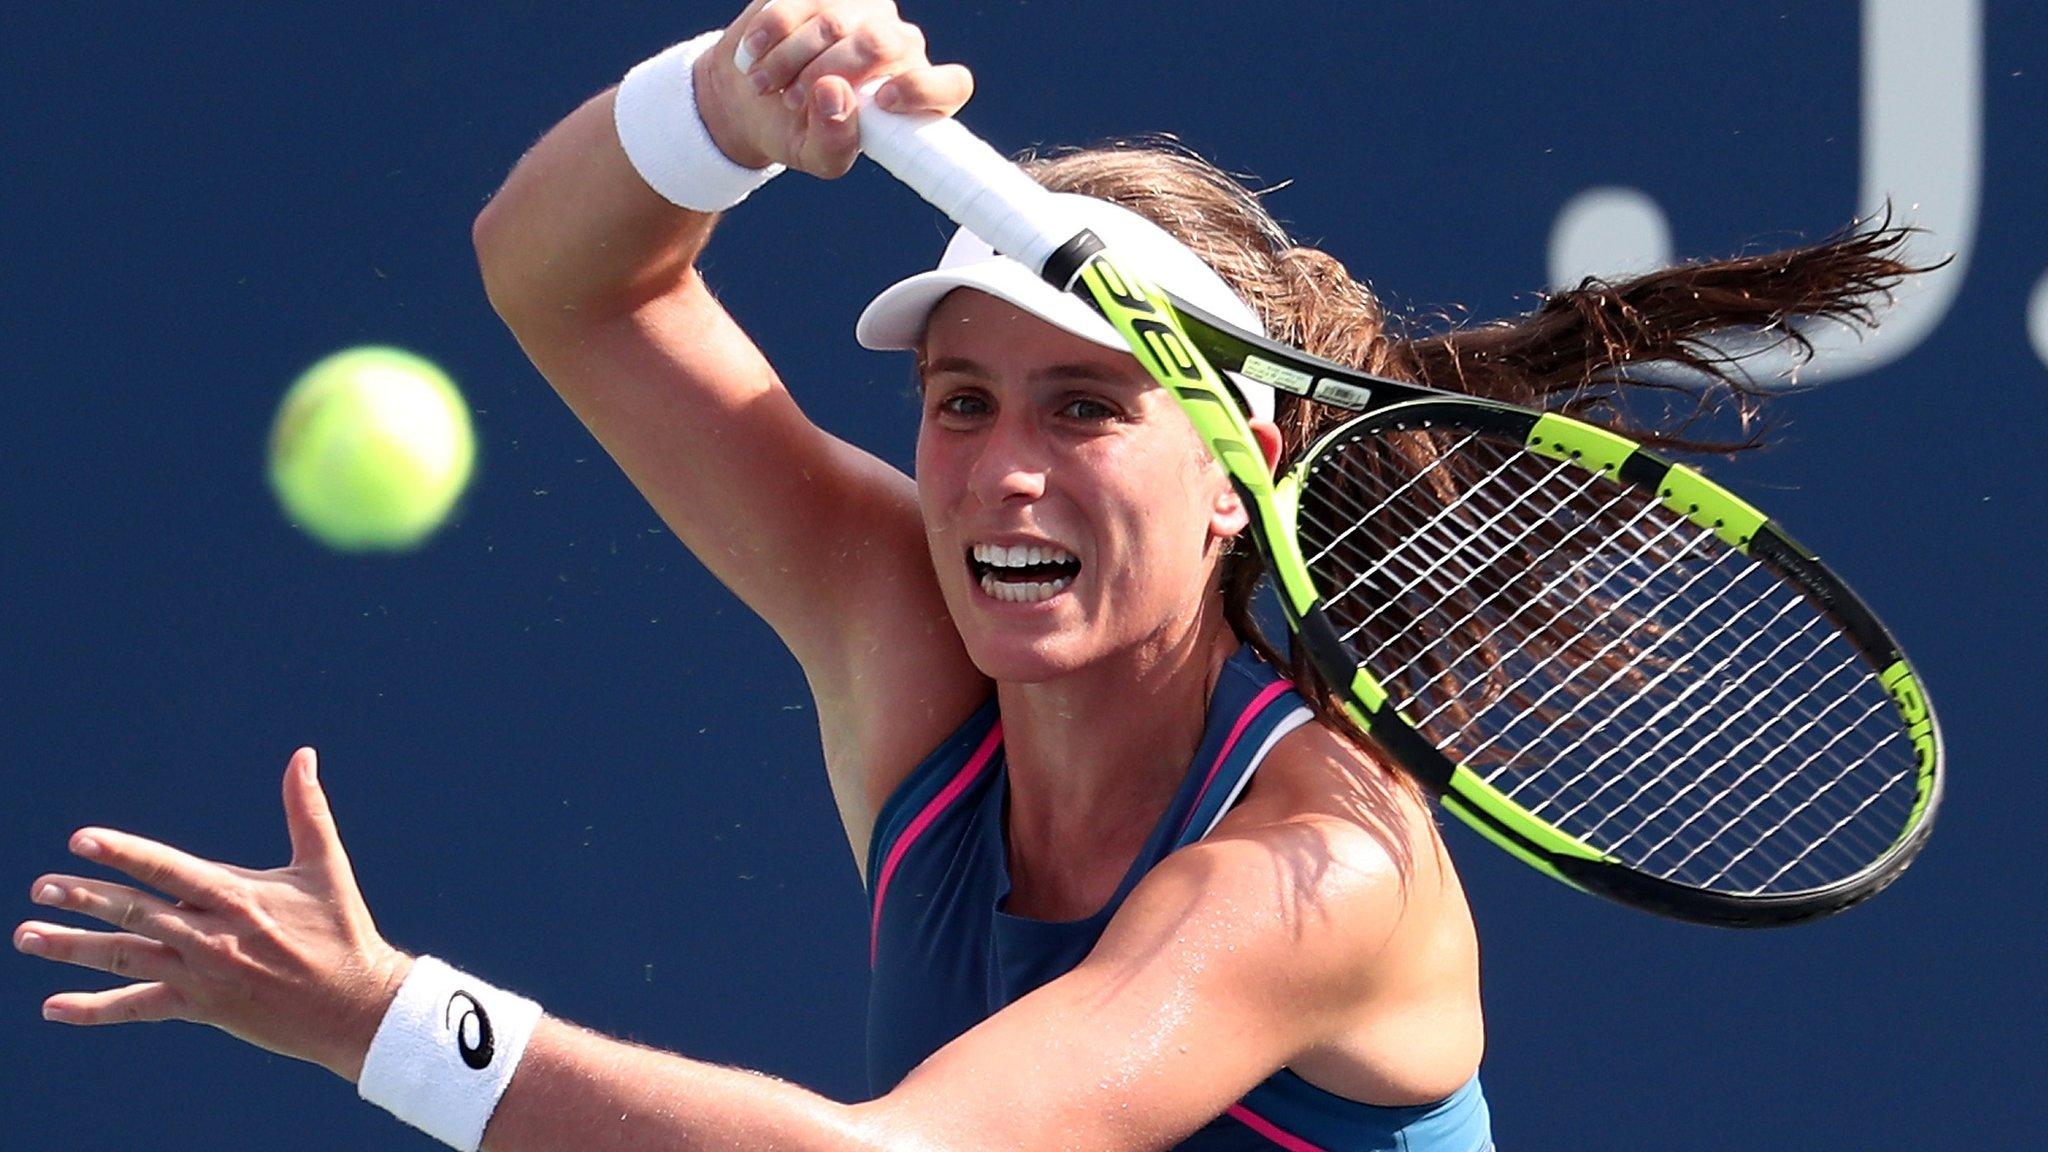 Pan Pacific Open: Johanna Konta beats Gabriela Dabrowski to reach round of 16